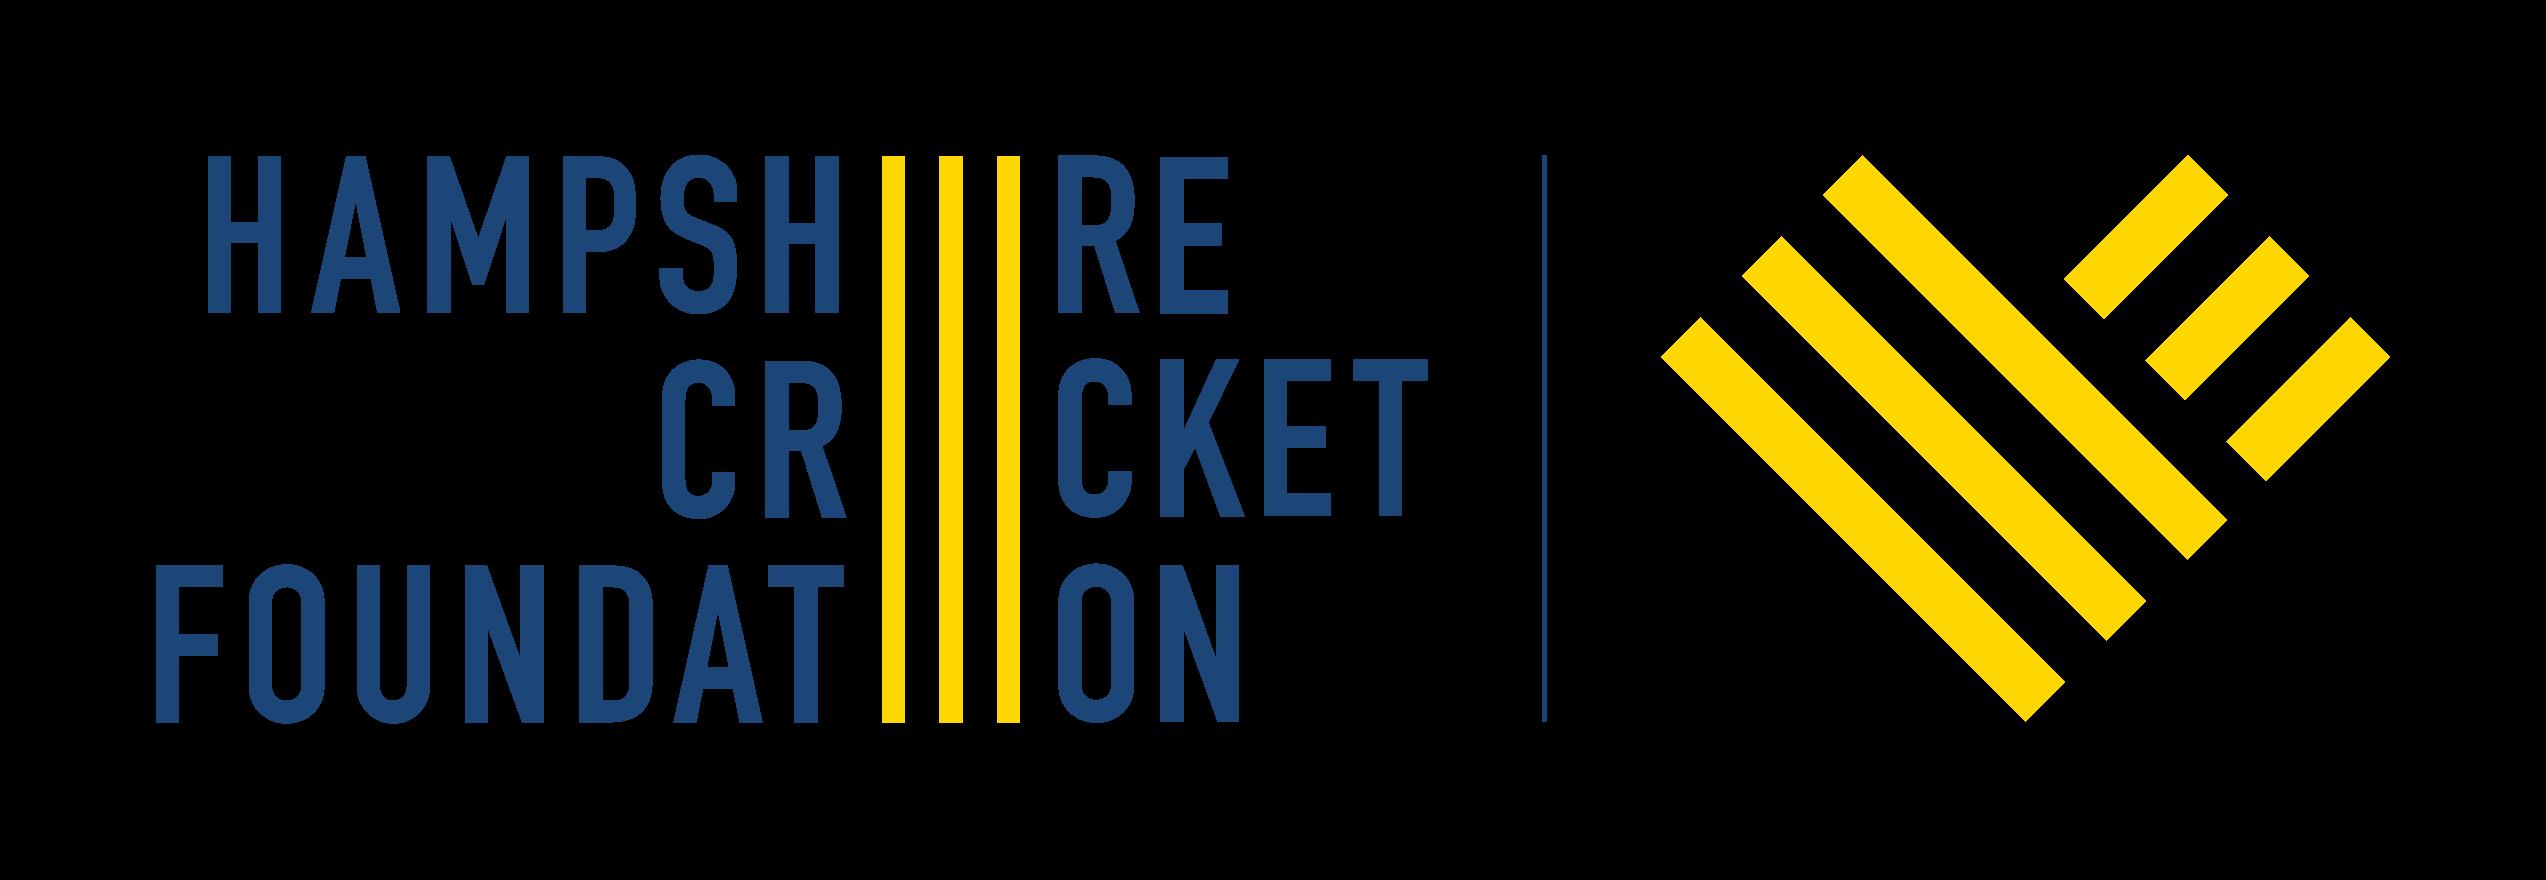 hampshire Cricket Foundation